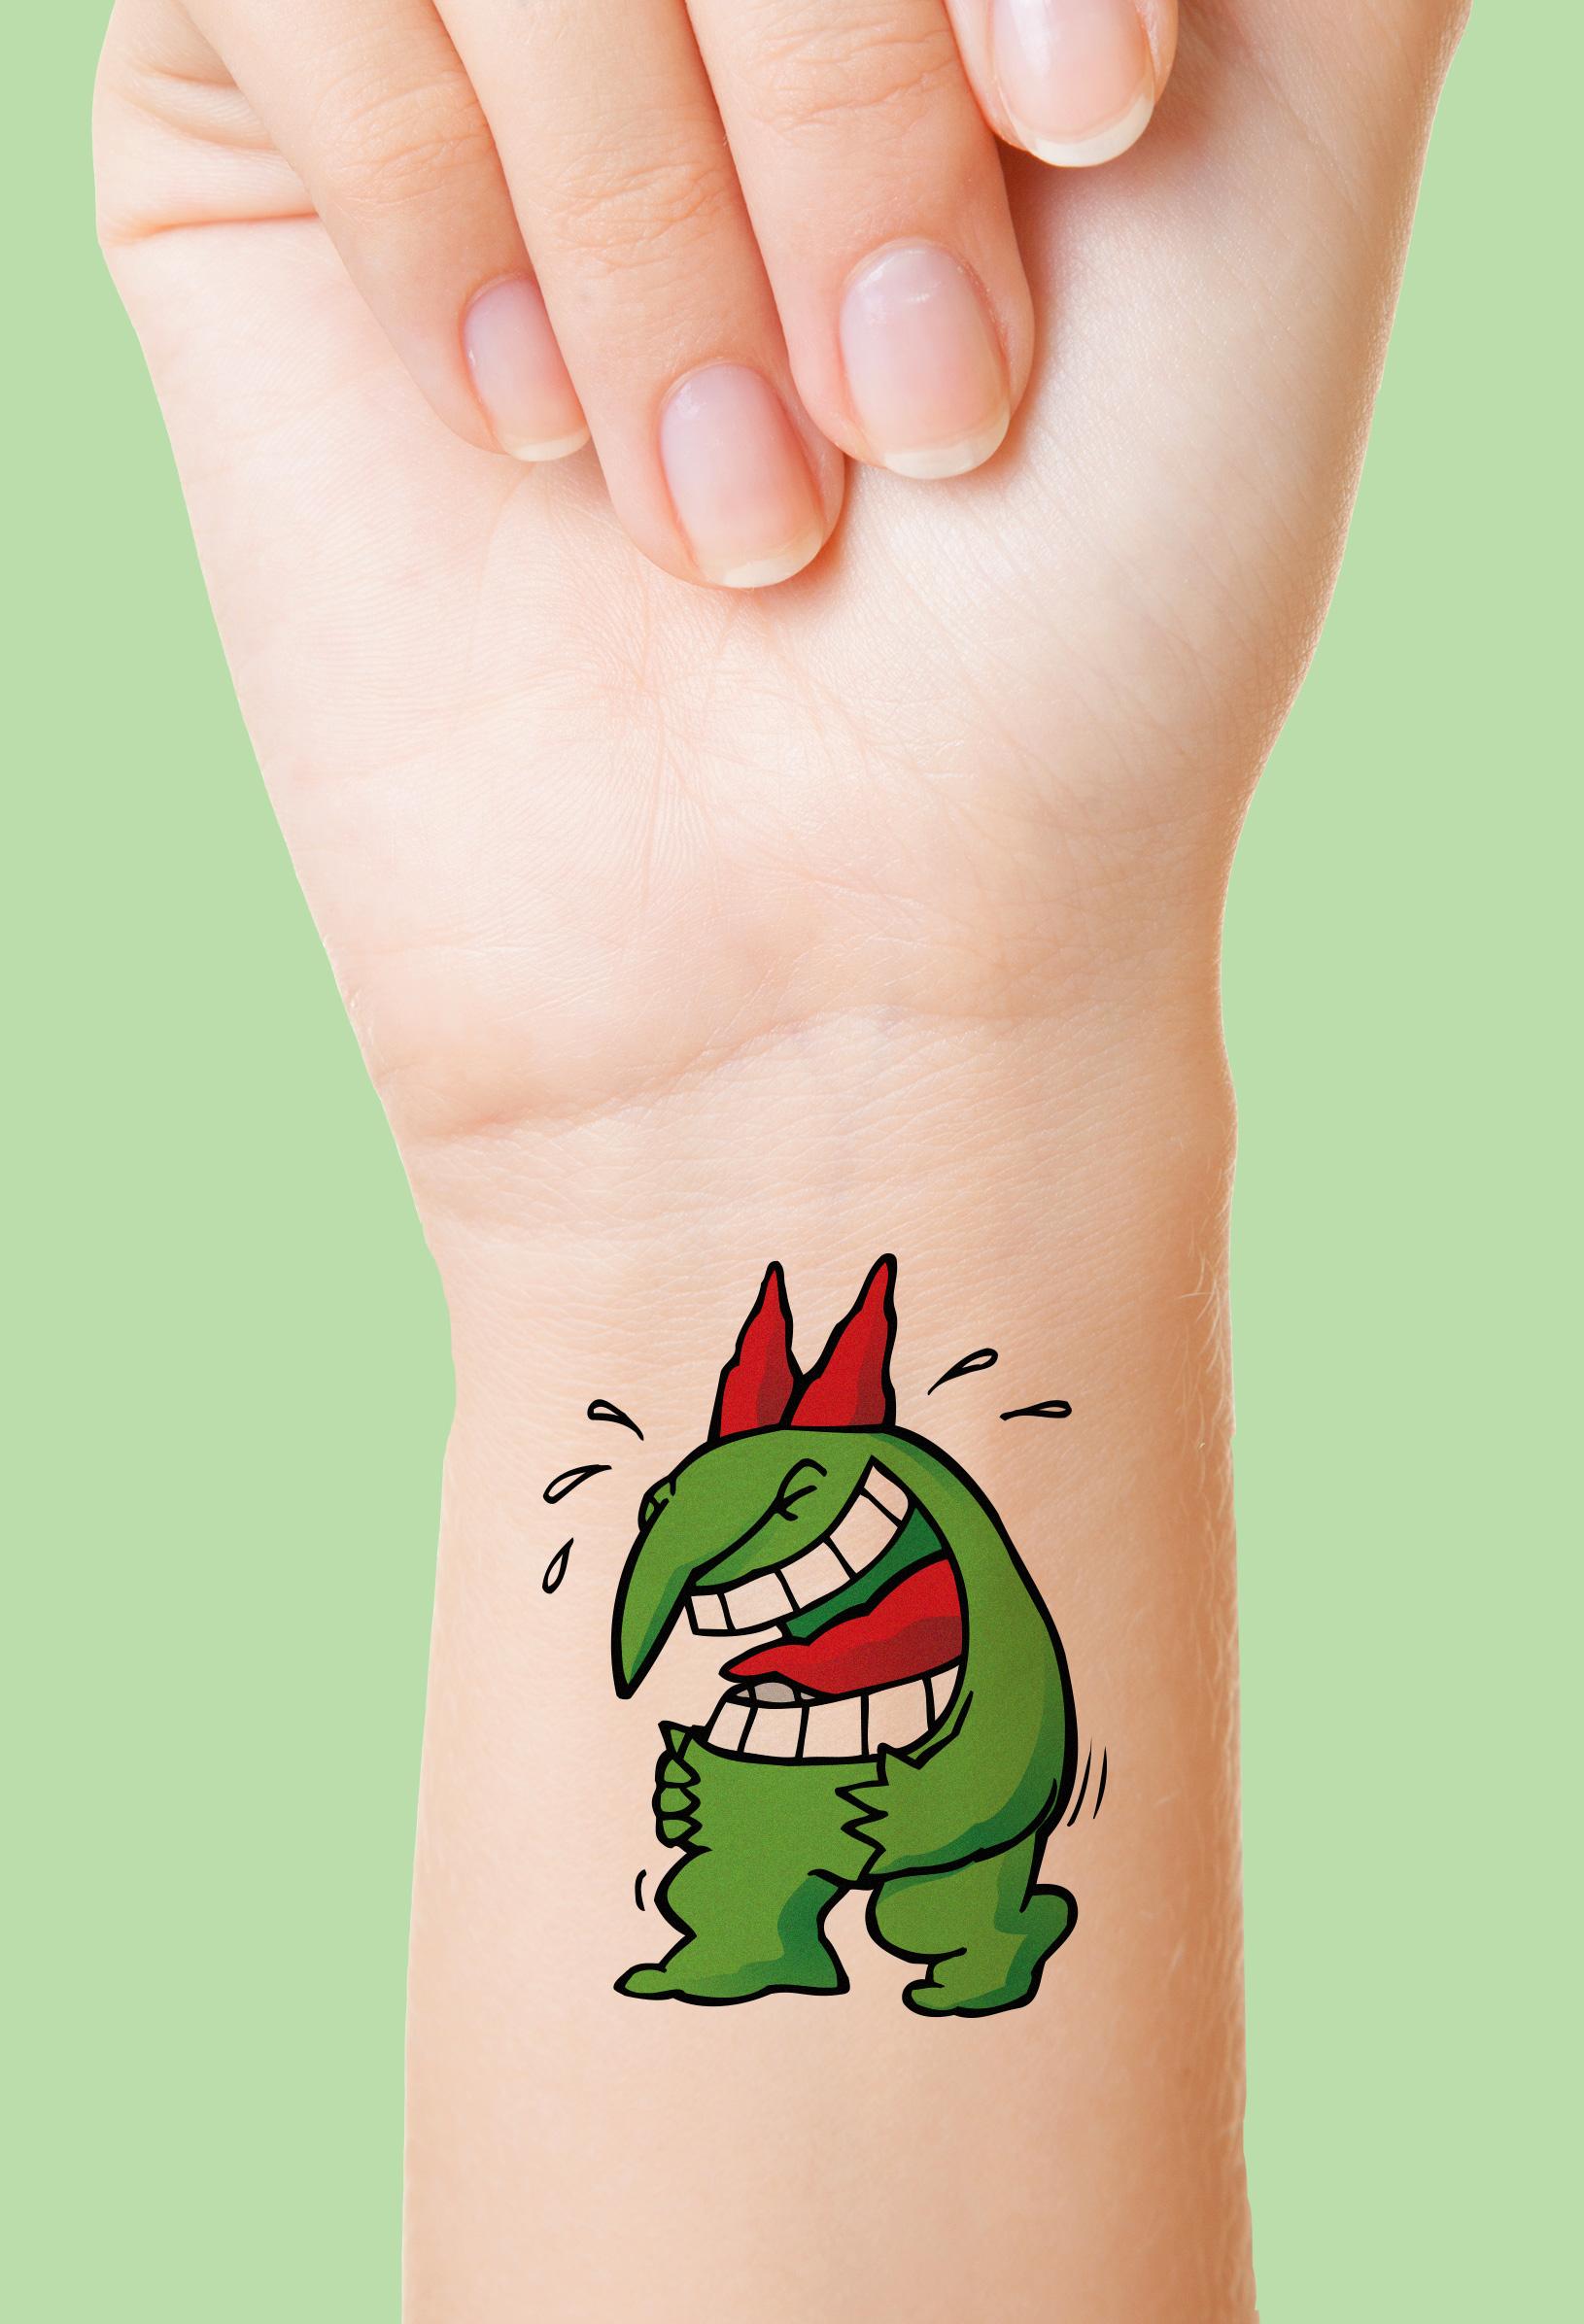 JUSTE POUR RIRE / Tattoo  Impression, promotion